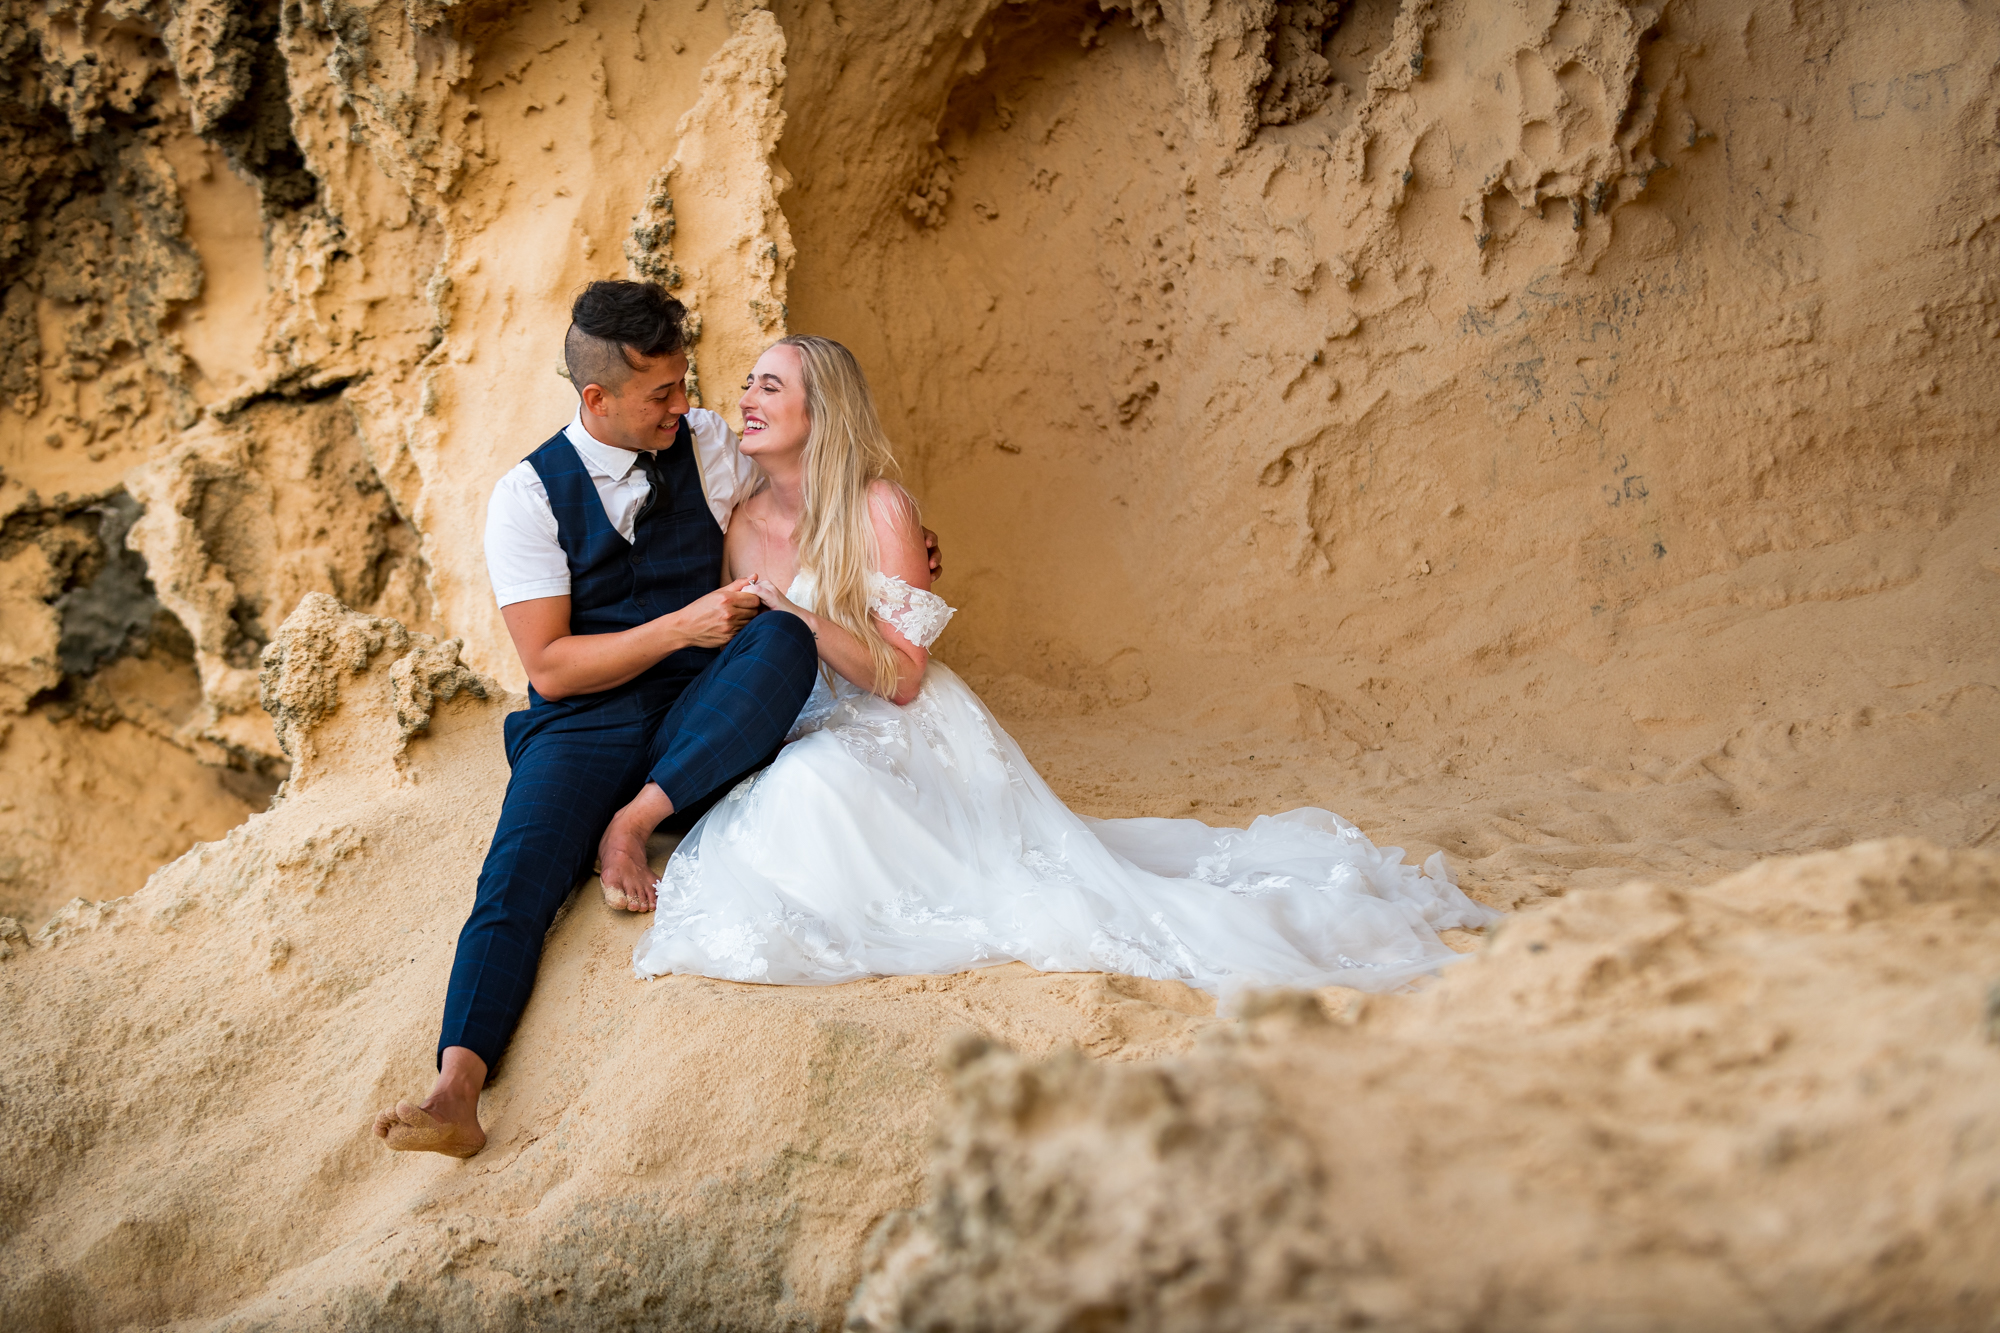 sunrise-wedding-coleen-shipwrecks-6-29-2919-9488.jpg